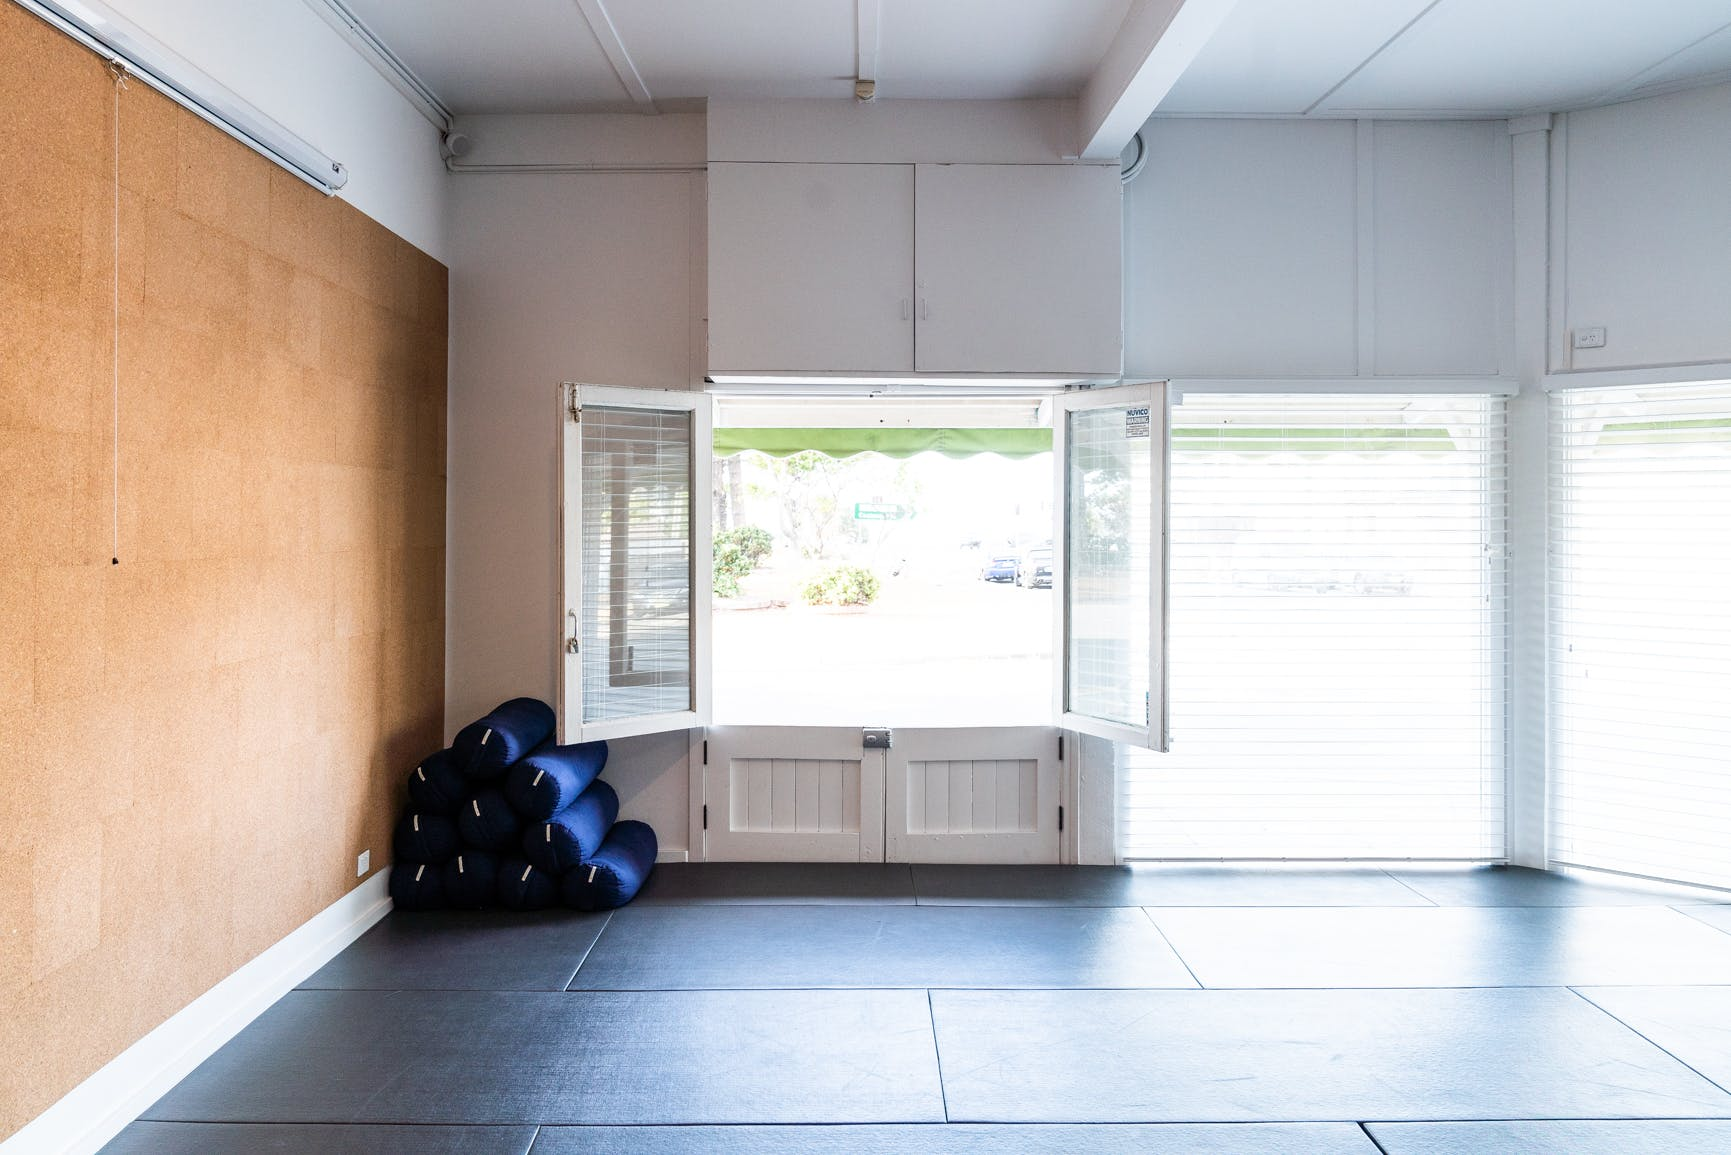 Studio Space, multi-use area at + space, image 2